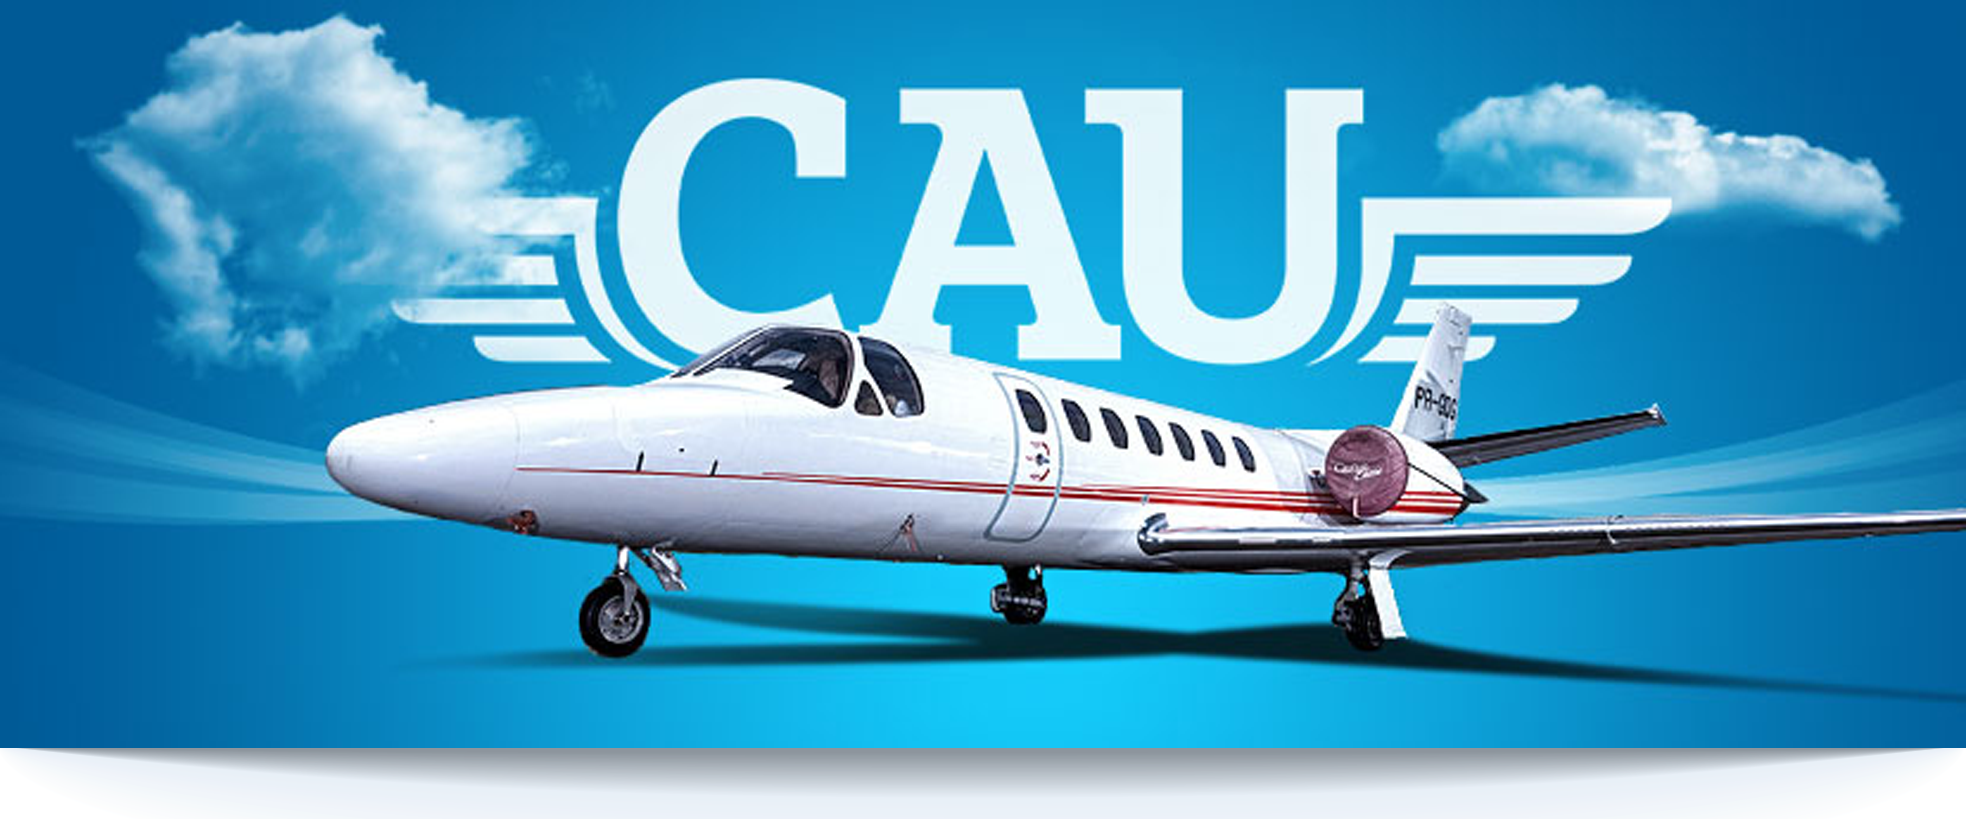 logo of plane